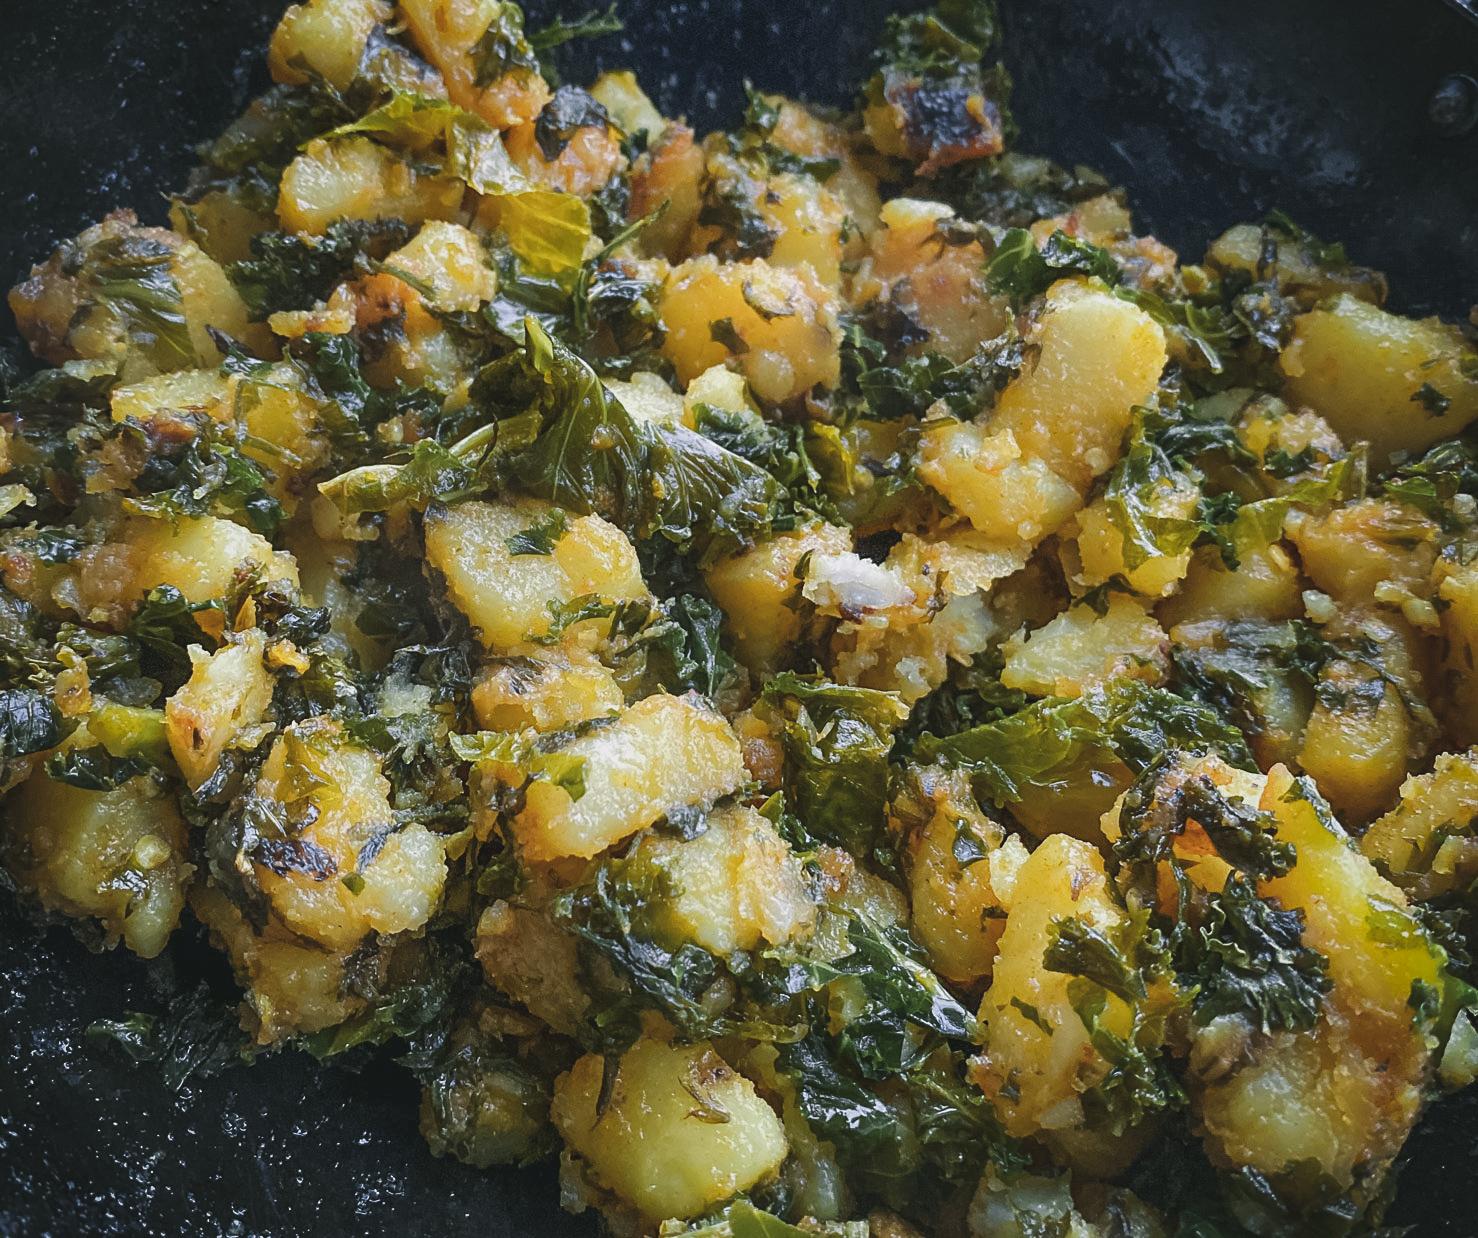 Sauteed potatoes with kale recipe